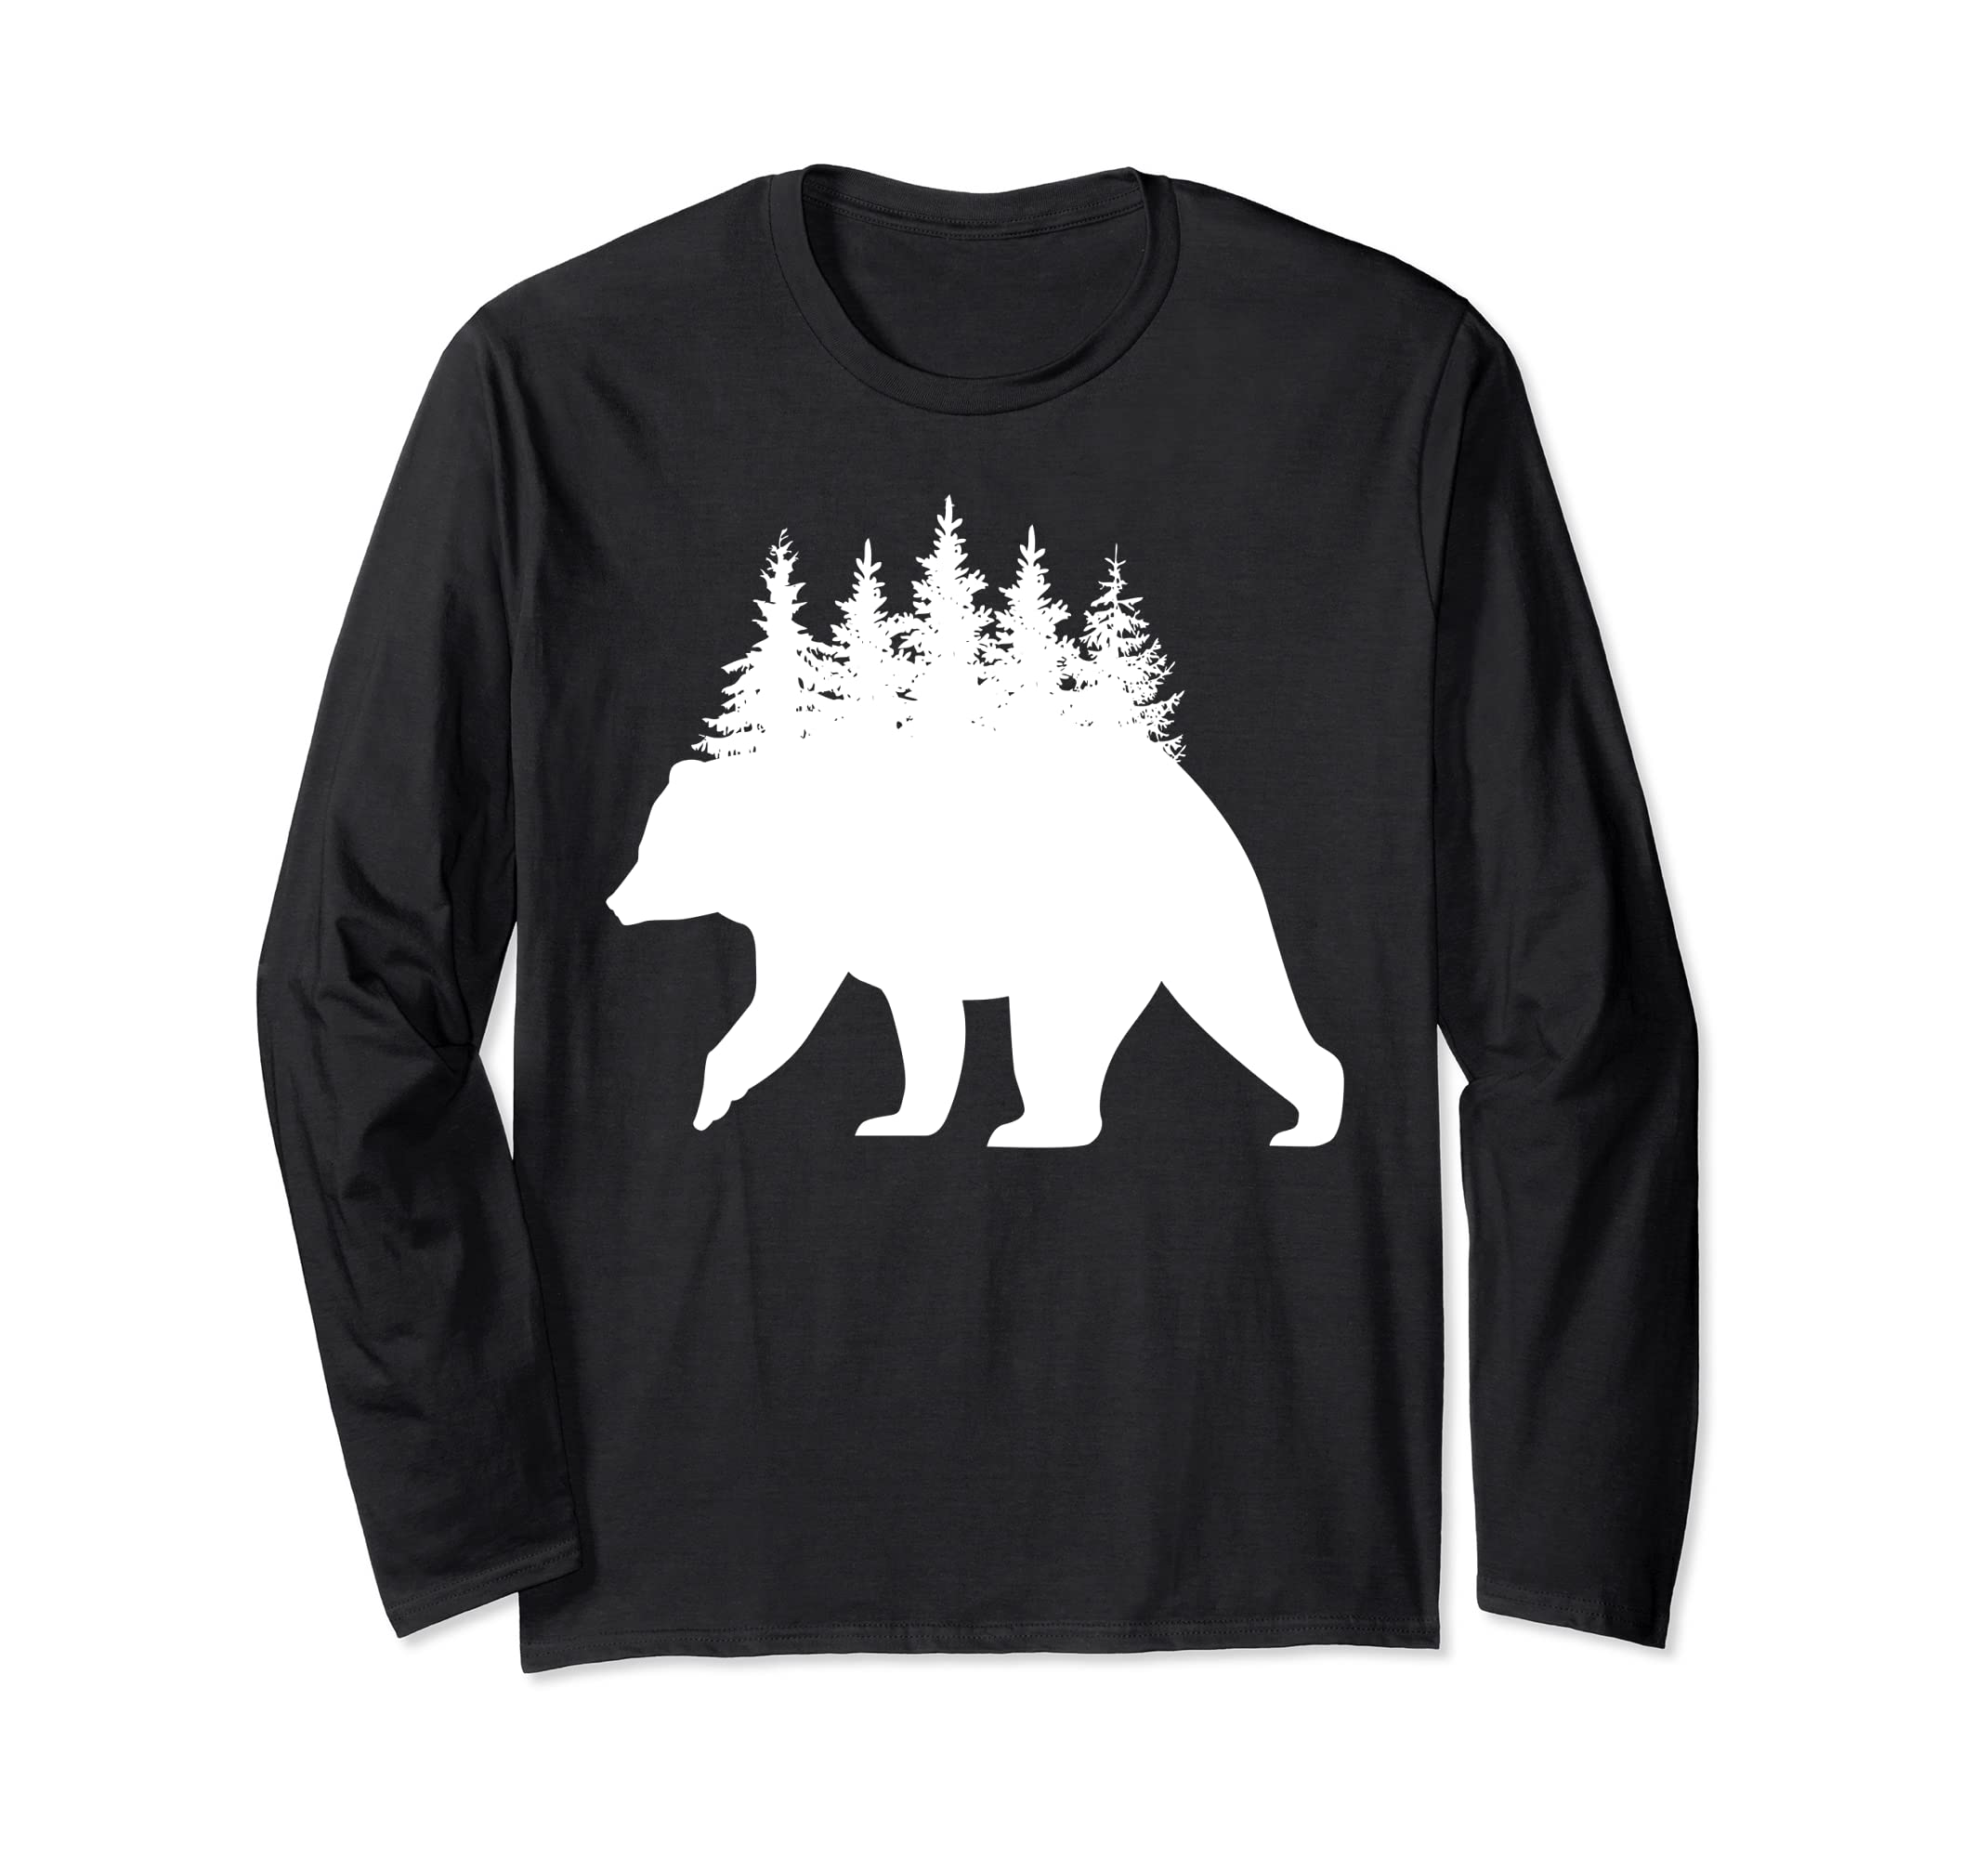 Bear Hunting Treeline Outdoors Wild Hunter Long Sleeve Shirt-Bawle